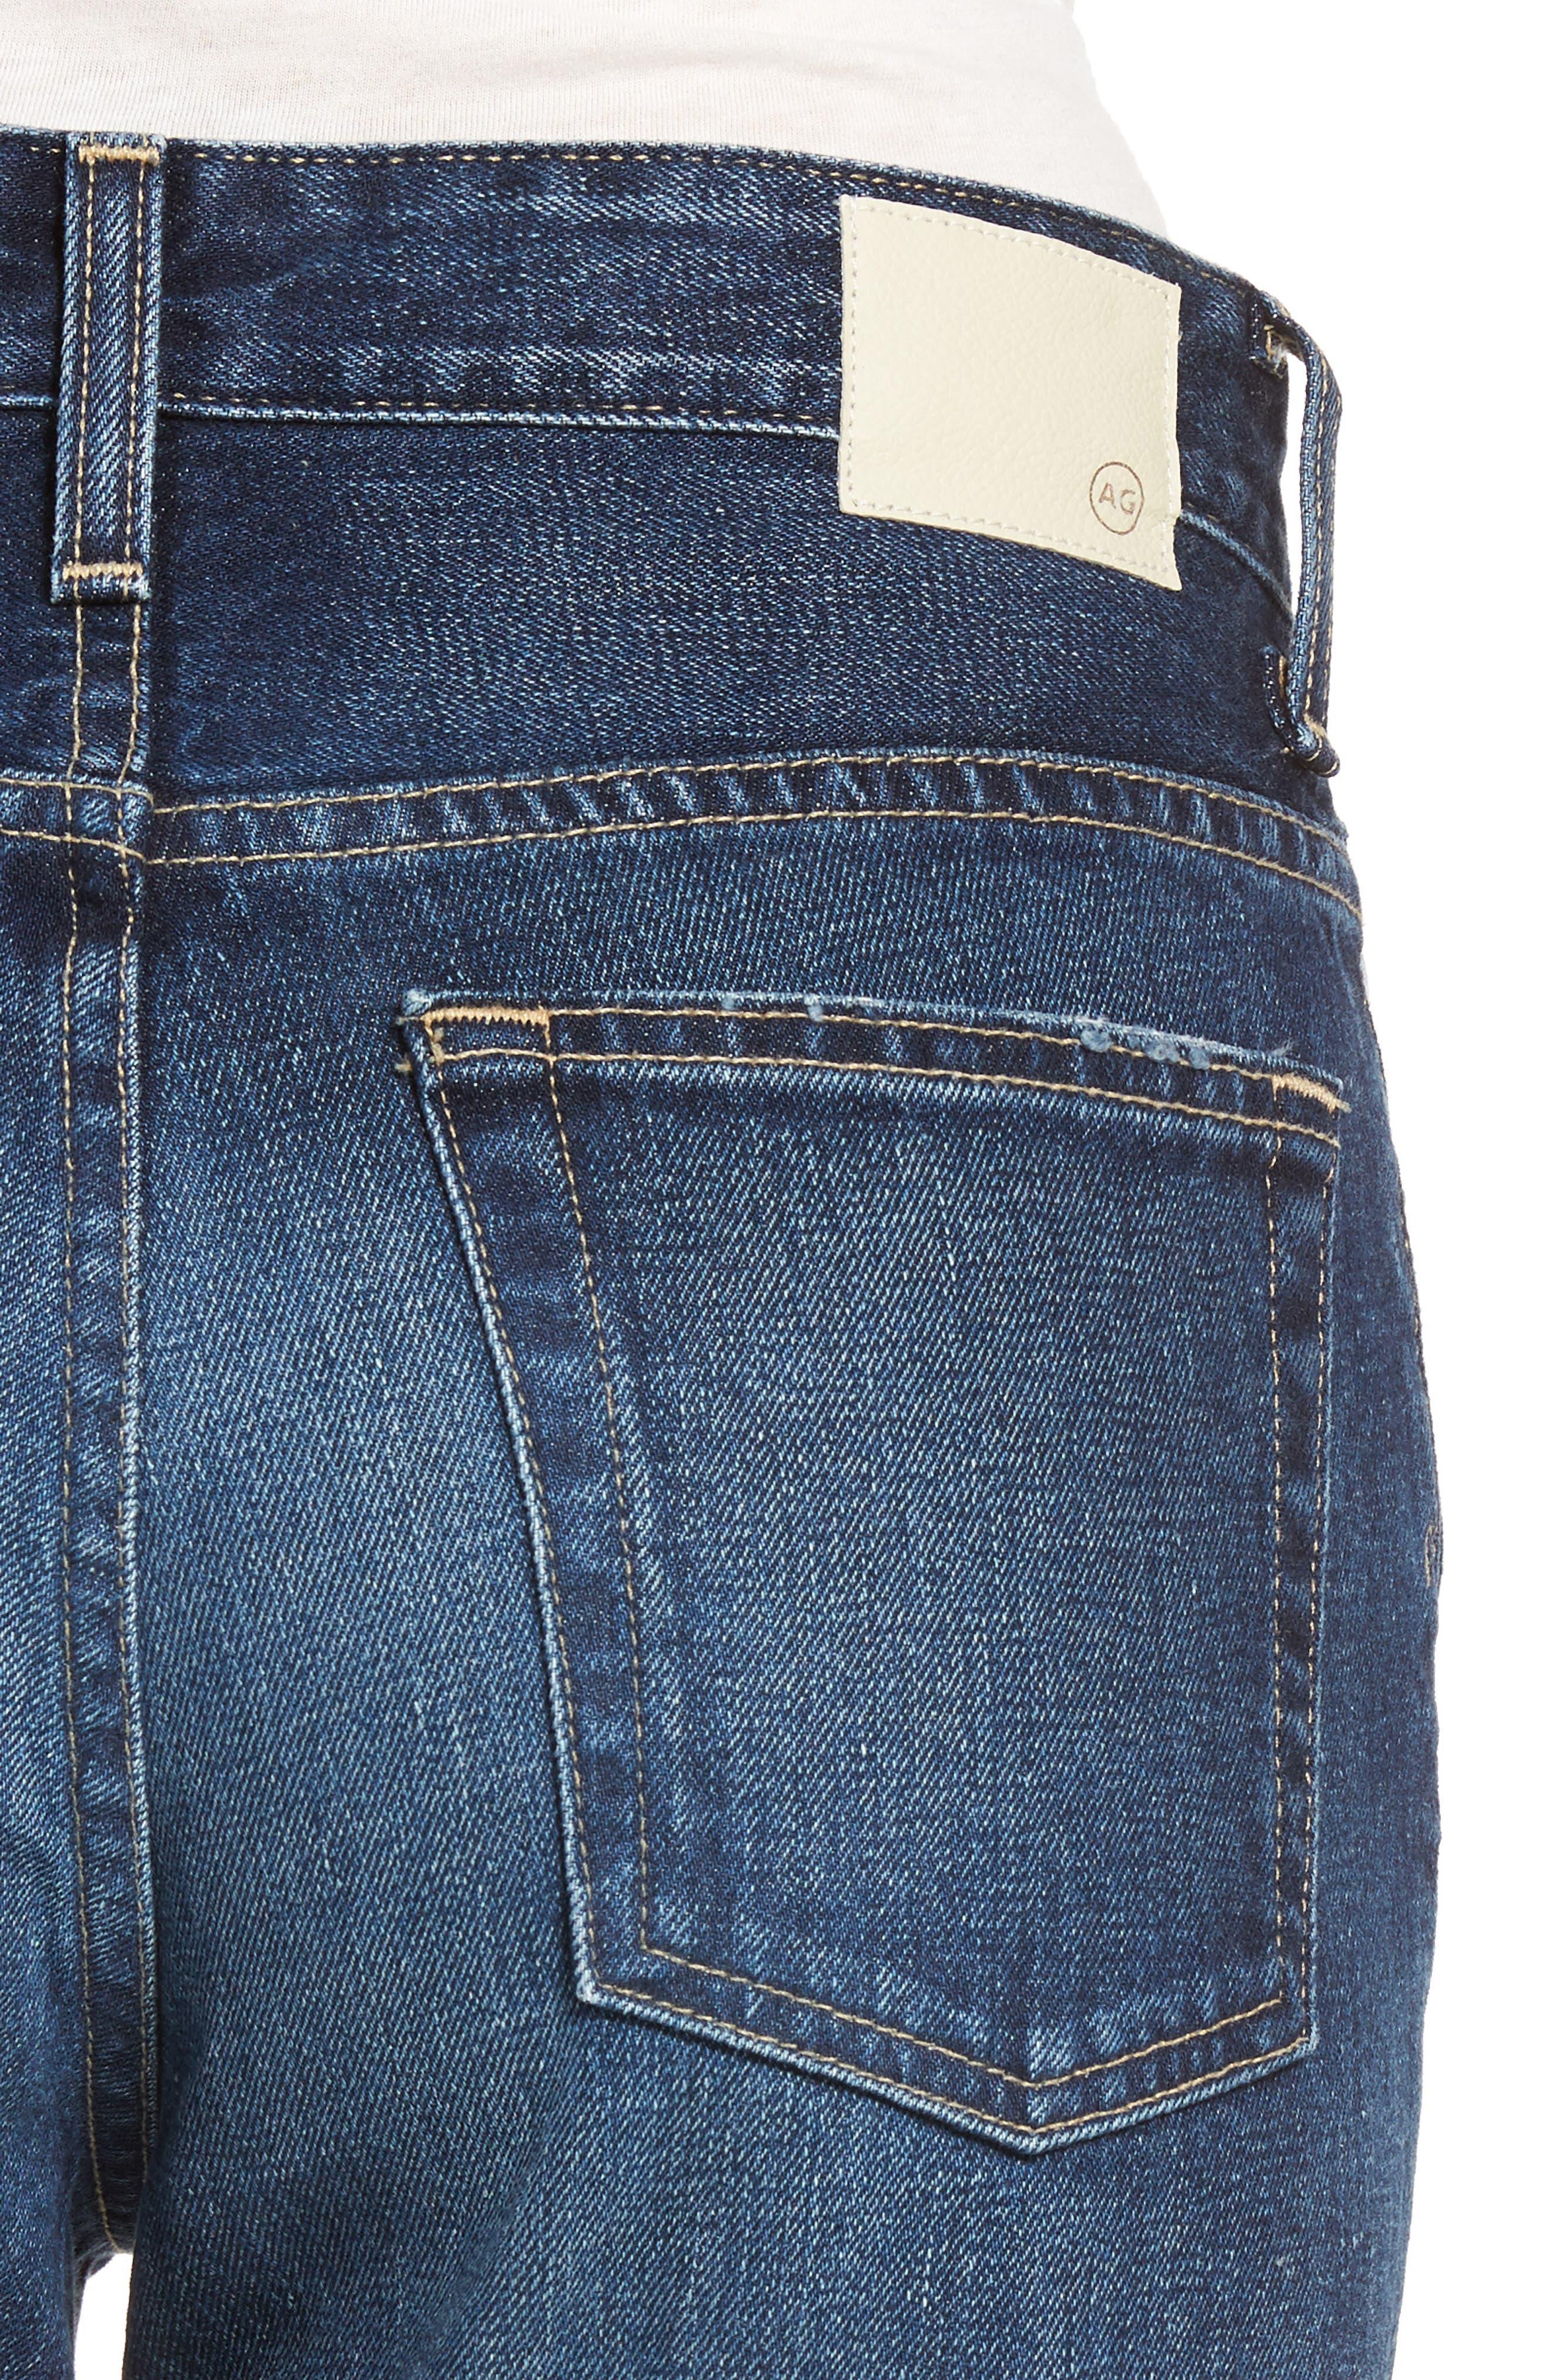 The Rhett Vintage High Waist Crop Jeans,                             Alternate thumbnail 6, color,                             11 Years Jubilee